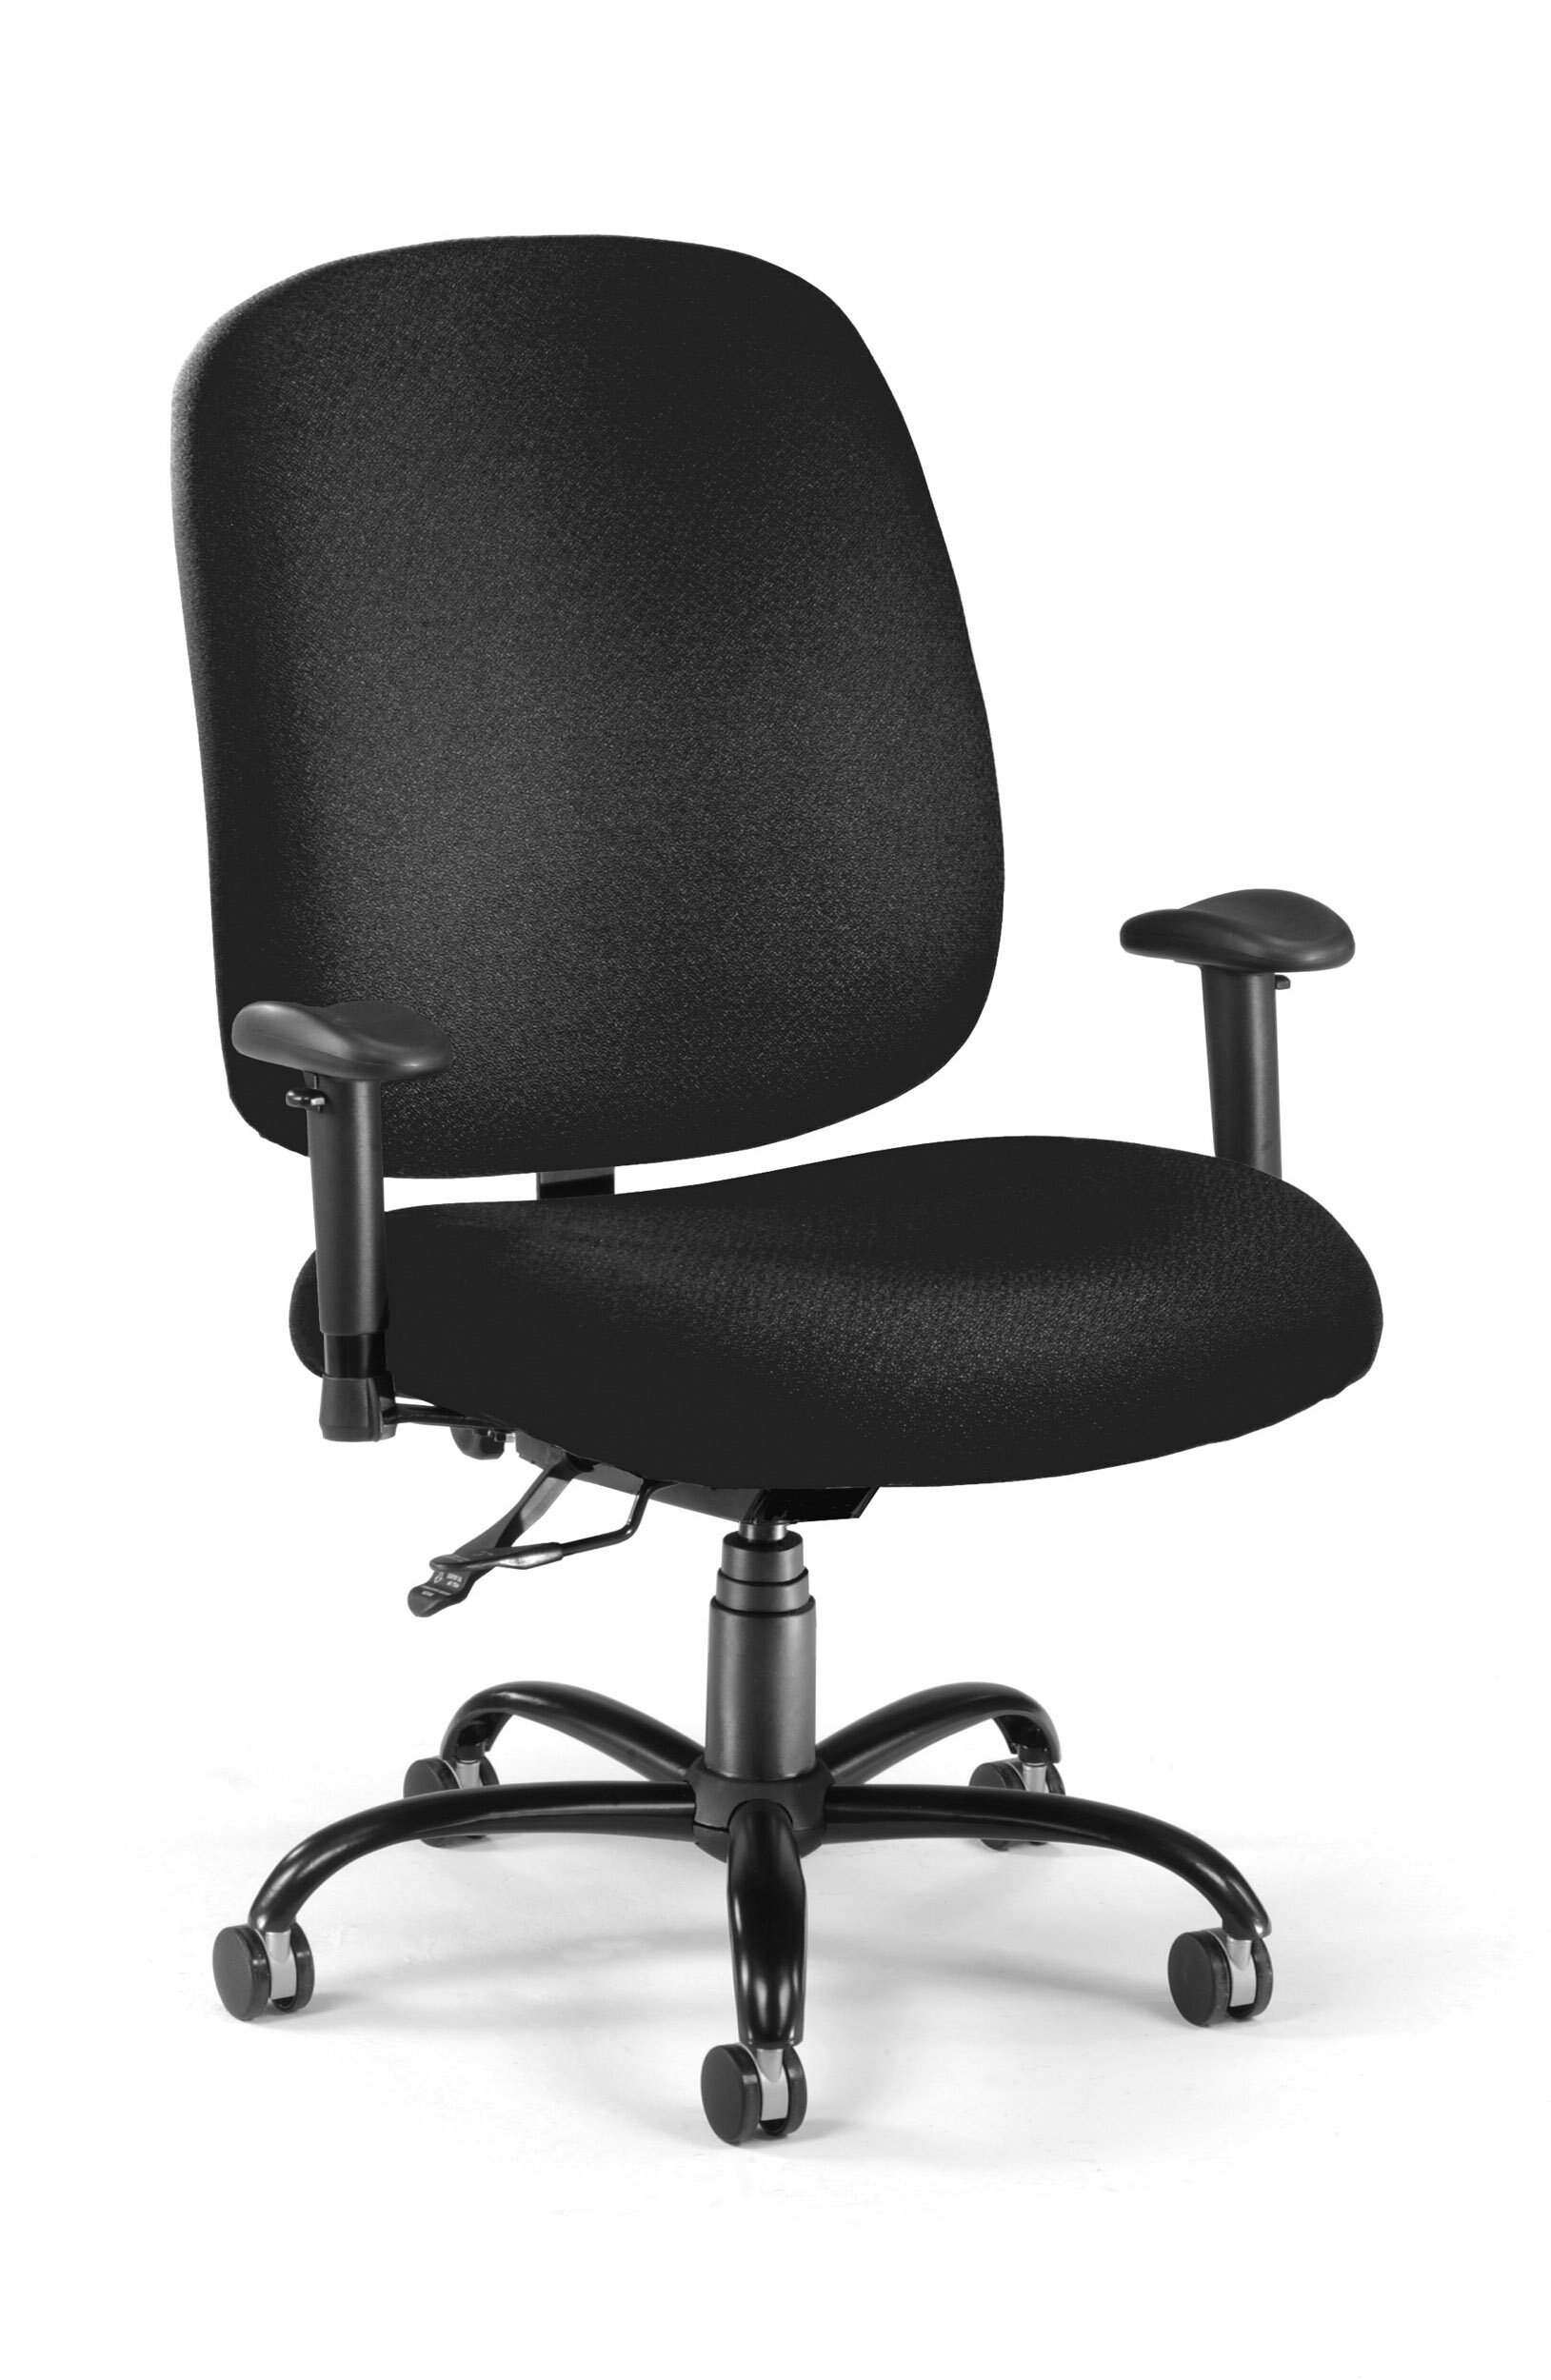 Ofm big and tall high back desk chair wayfair